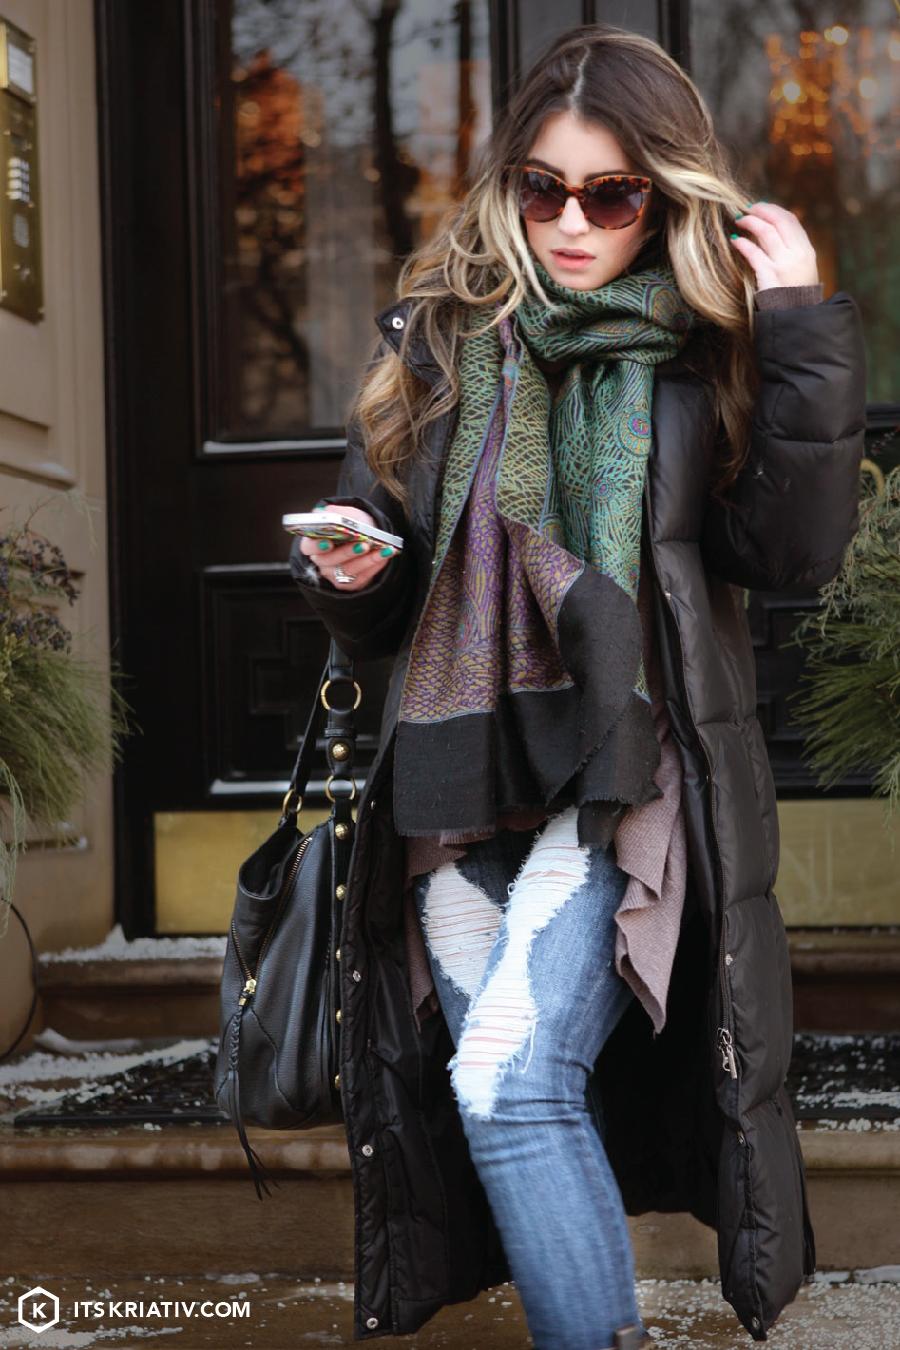 13_Jan_Fashion_Beautiful_Boston-06.jpg